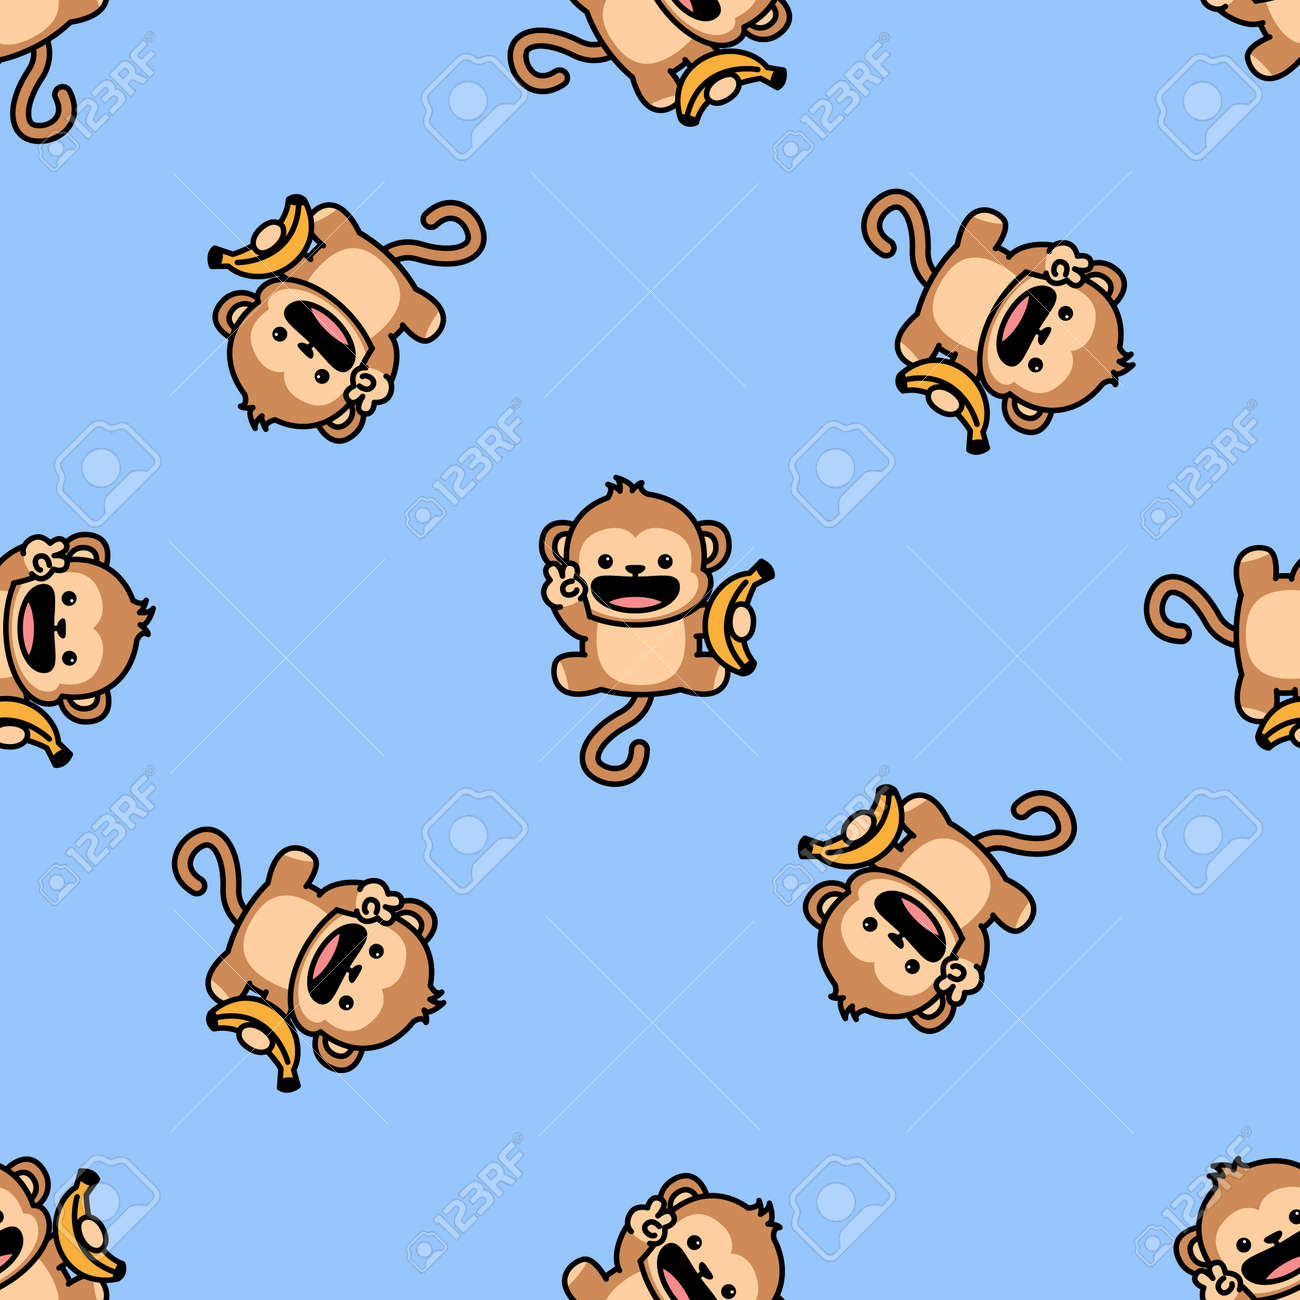 Cute monkey holding banana cartoon seamless pattern, vector illustration - 169153194